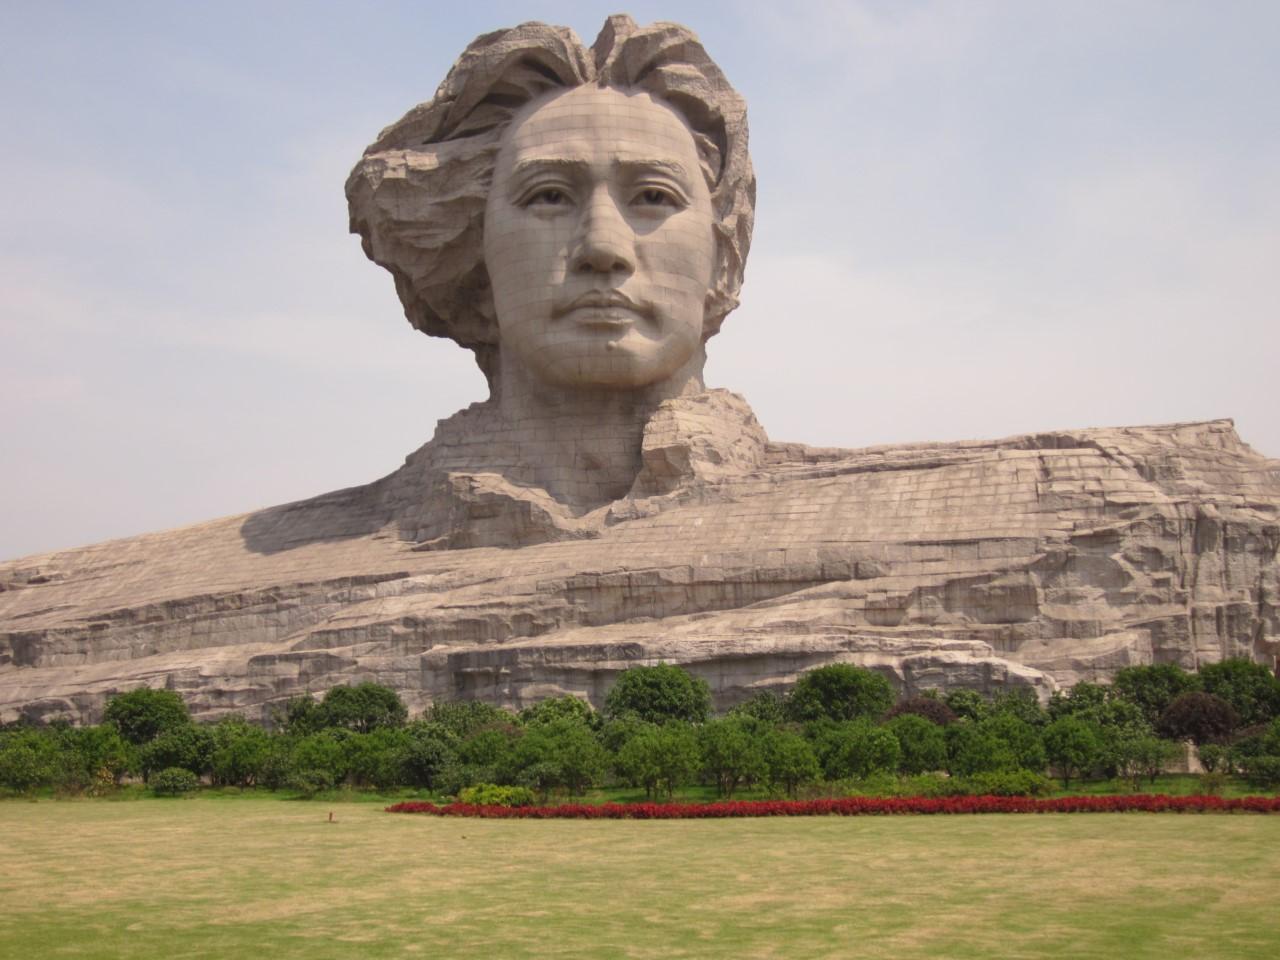 Огромная голова молодого Мао